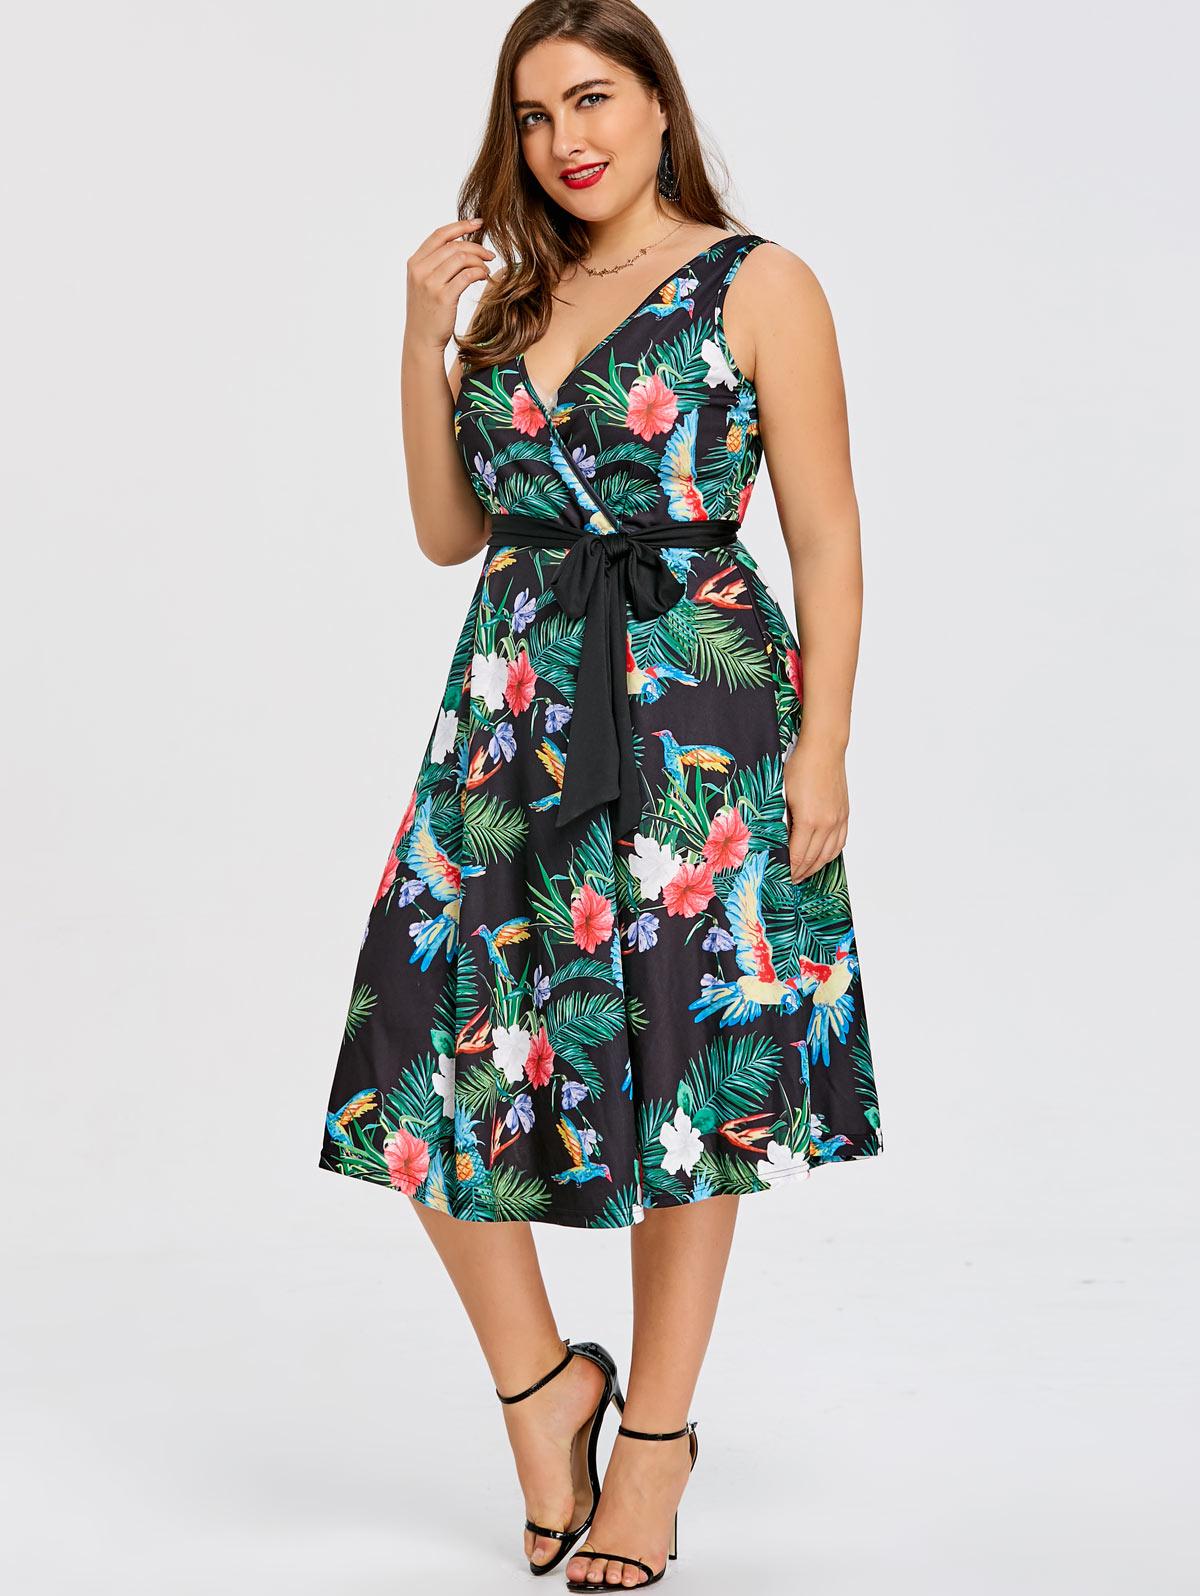 US $14.68 55% OFF|Wipalo Plus Size Hawaiian Leaf Midi Boho Dress Women  Sleeveless V Neck Belted Elegant Party Vintage Dresses Robe Vestido 5XL-in  ...